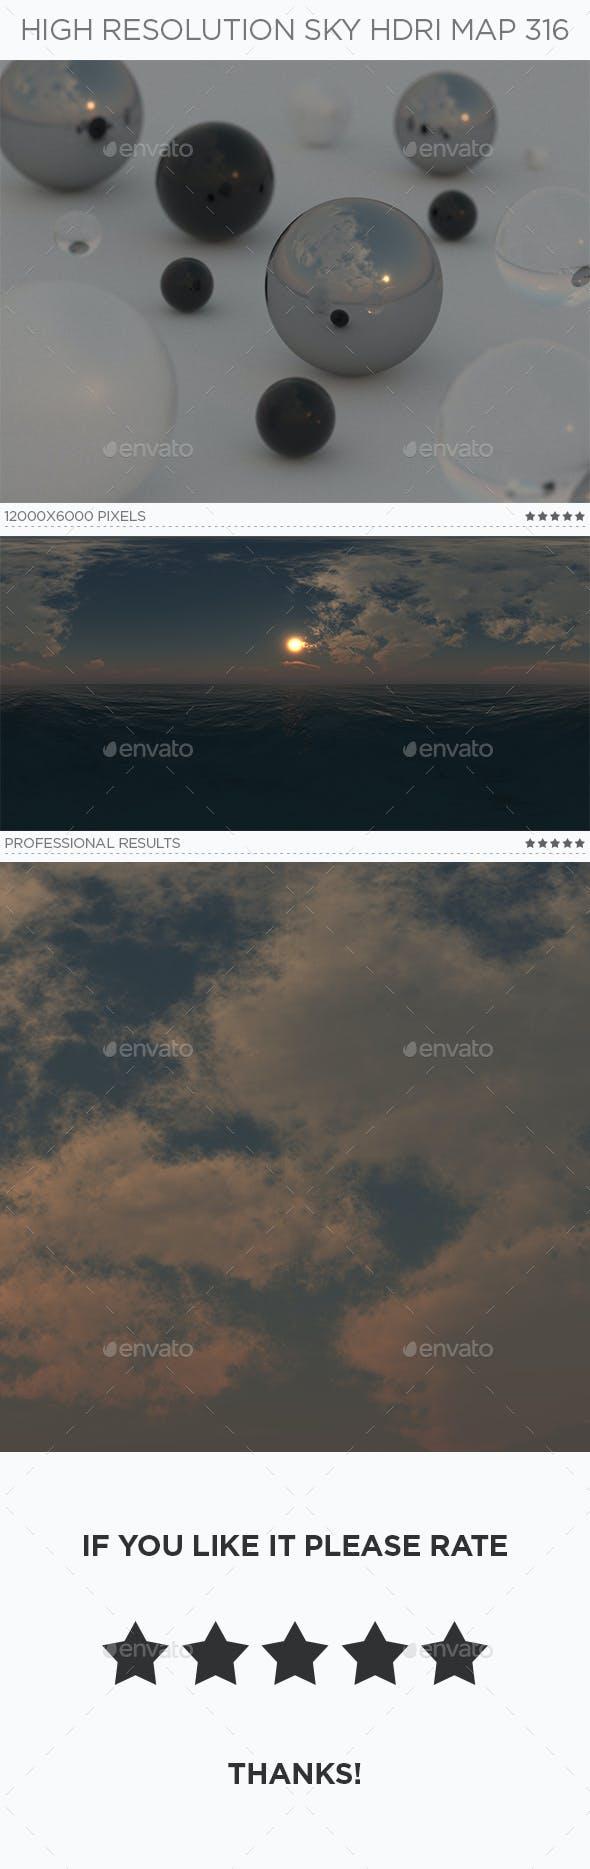 High Resolution Sky HDRi Map 316 - 3DOcean Item for Sale